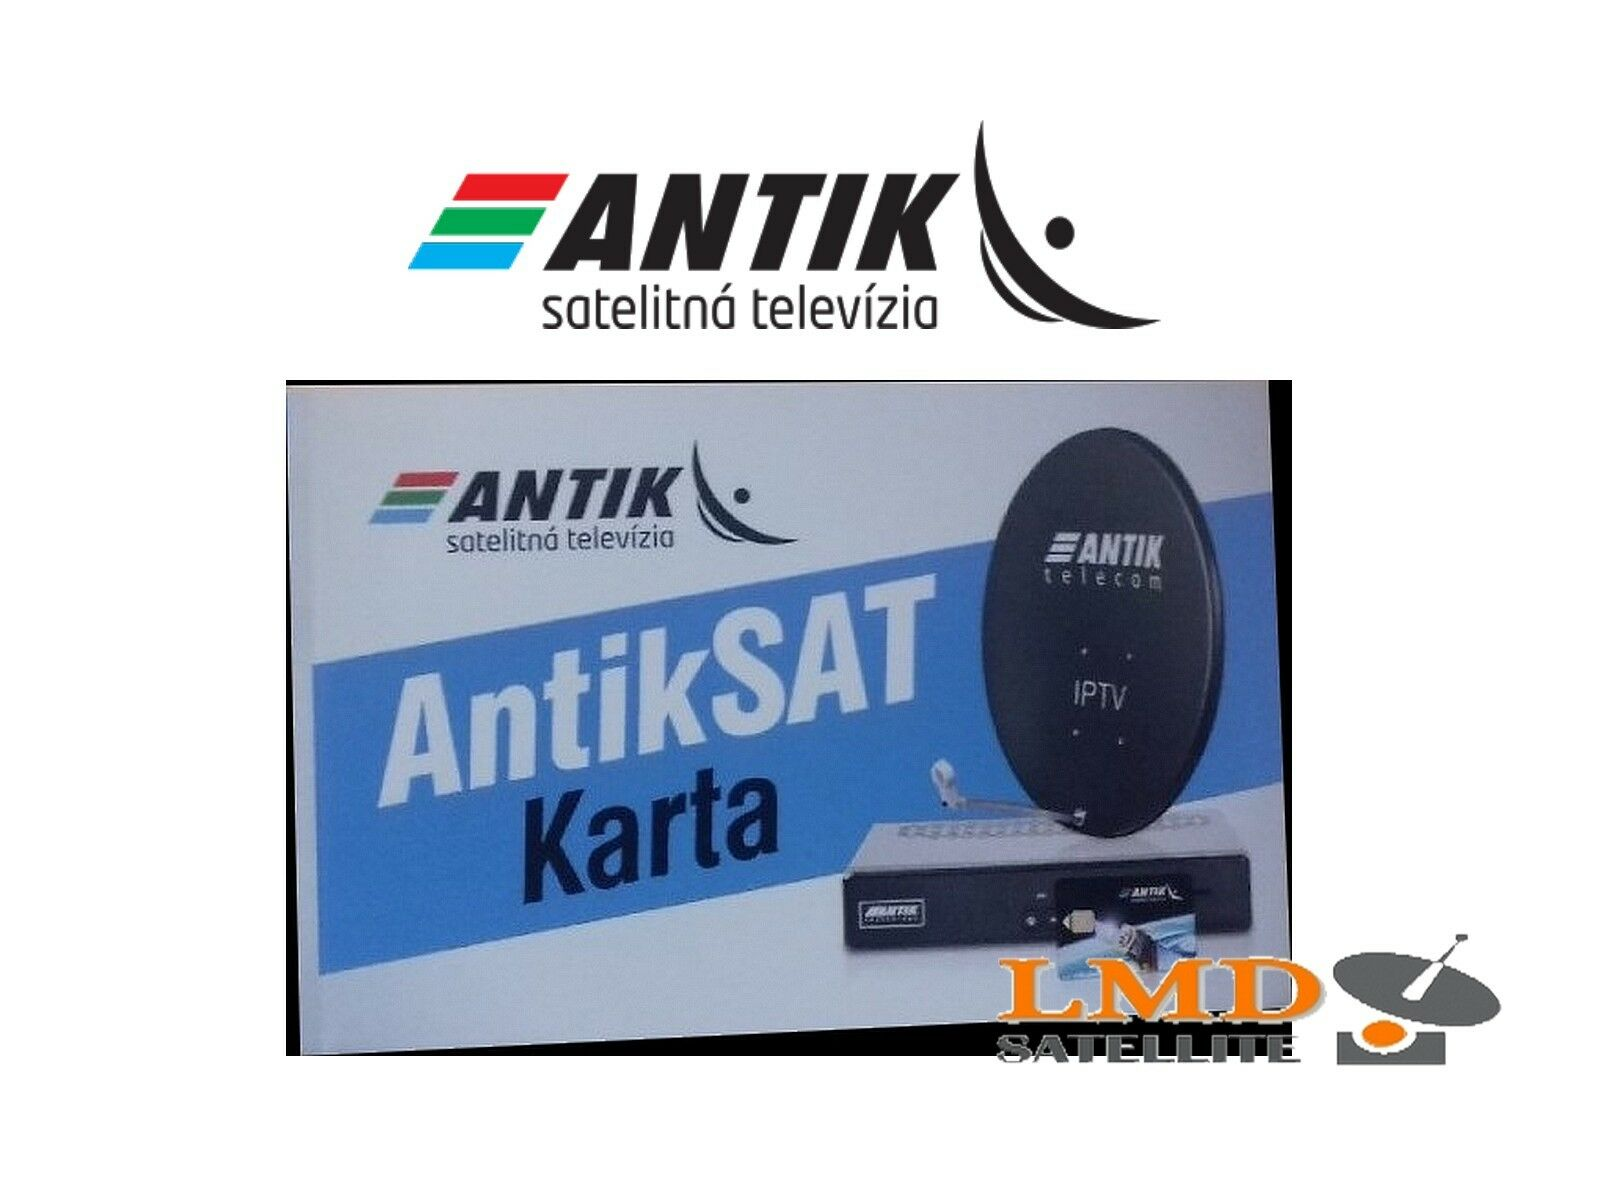 d876e3740 Antiksat Satellite Subscription Card Slovak and Czech TV Channels on ...